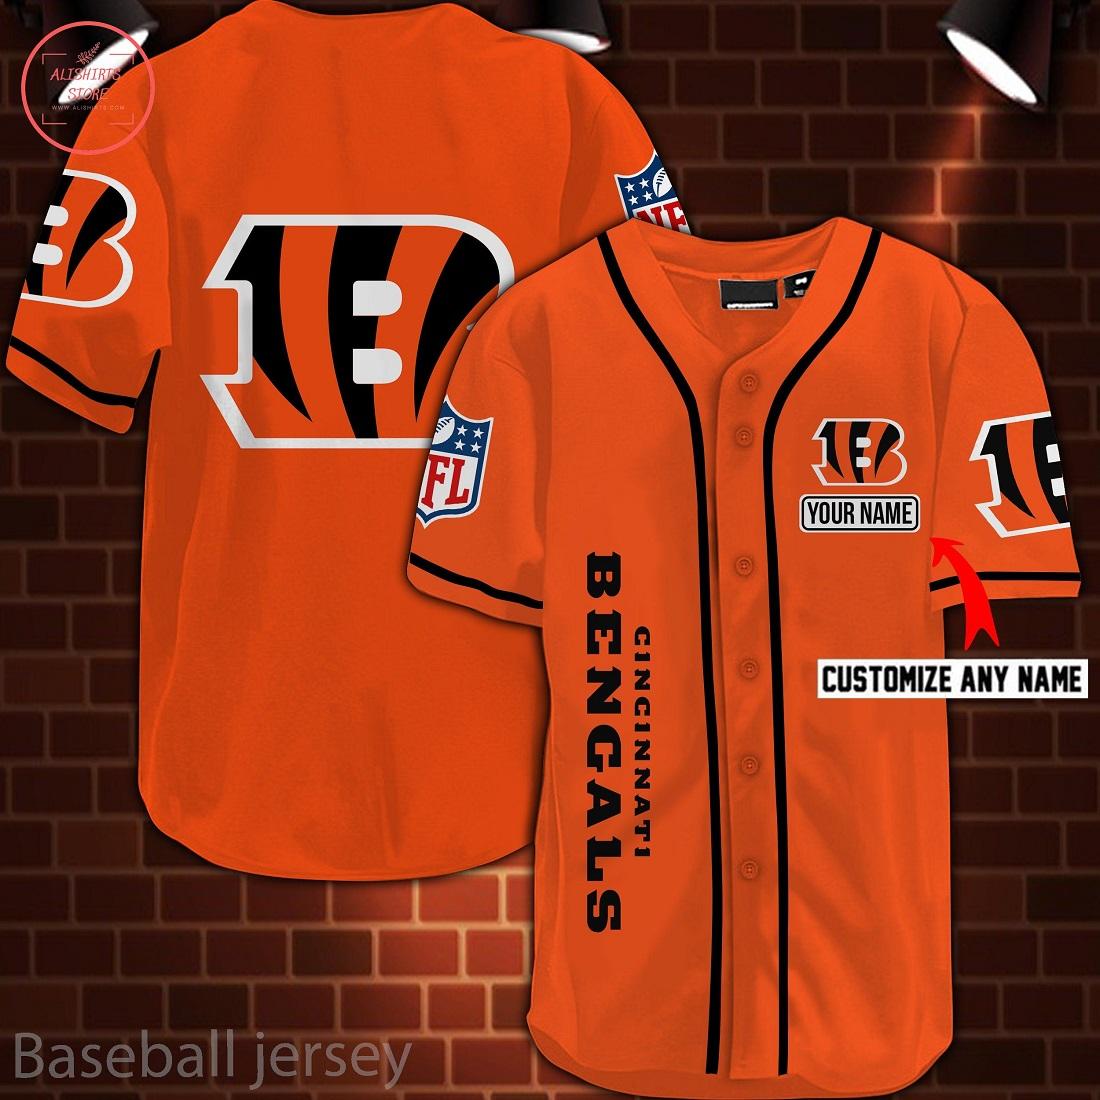 Nfl Cincinnati Bengals Personalized Baseball Jersey